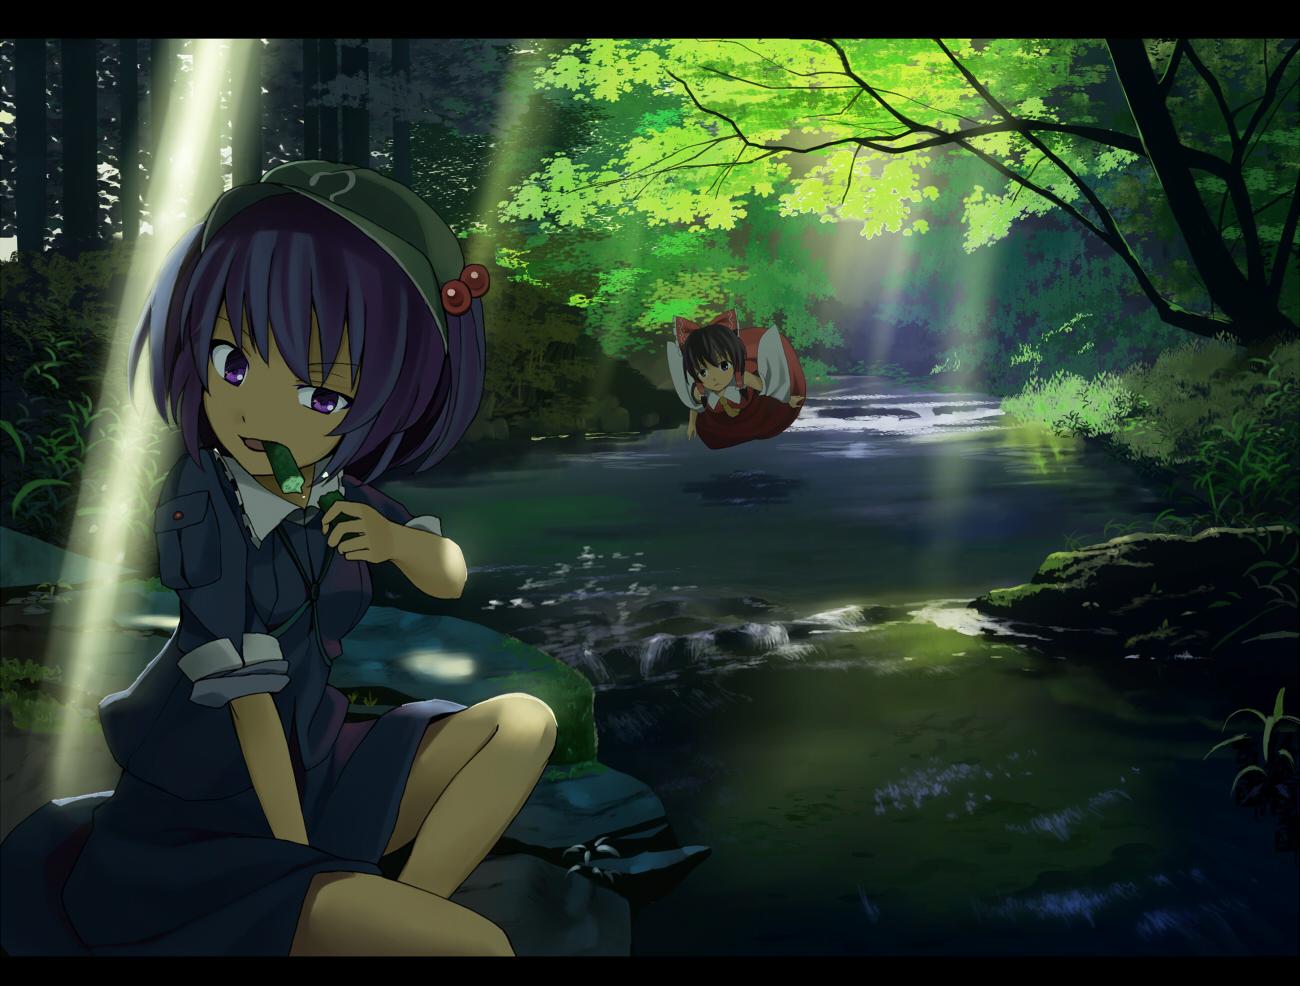 bow brown_eyes brown_hair dress forest hakurei_reimu hat japanese_clothes kawashiro_nitori miko purple_eyes purple_hair short_hair touhou tree water